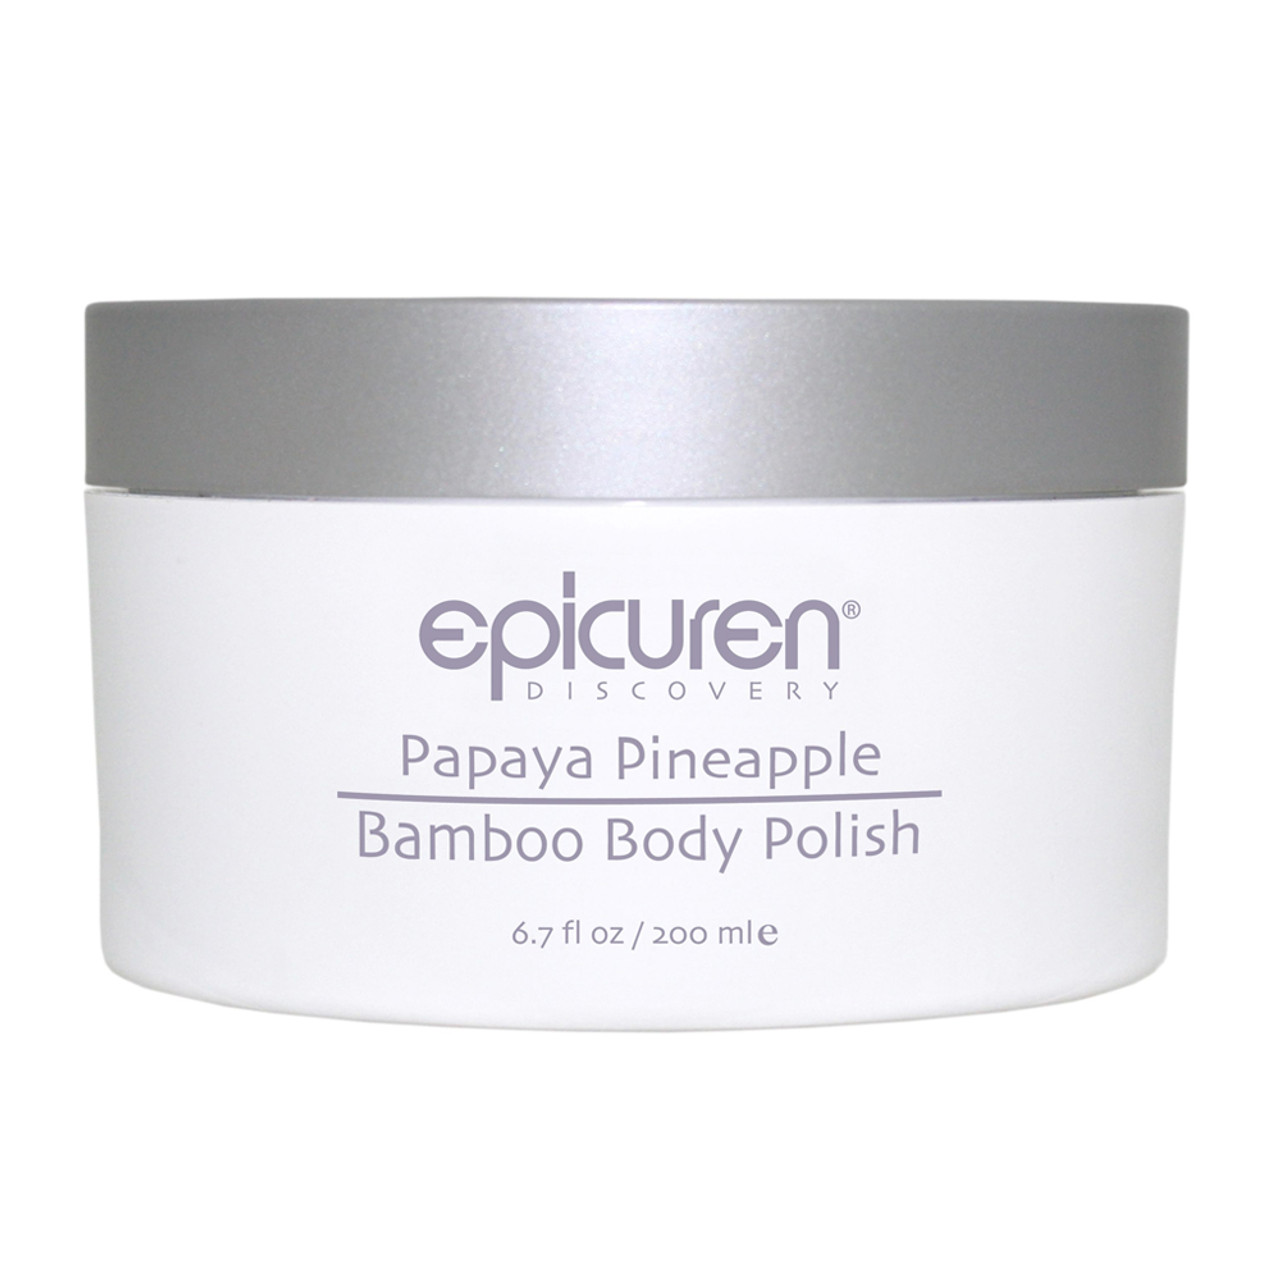 epicuren Discovery Papaya Pineapple Bamboo Body Polish